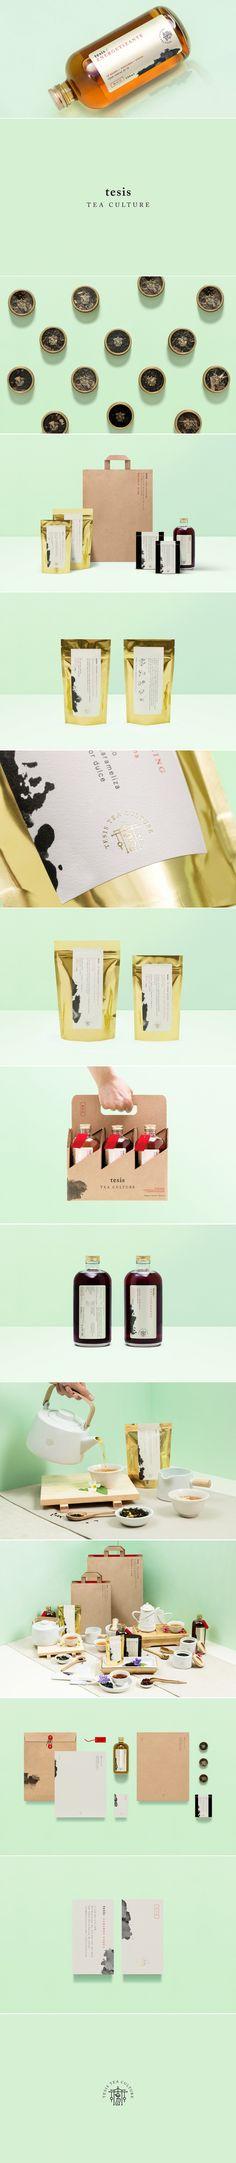 Tesis Tea — The Dieline   Packaging & Branding Design & Innovation News